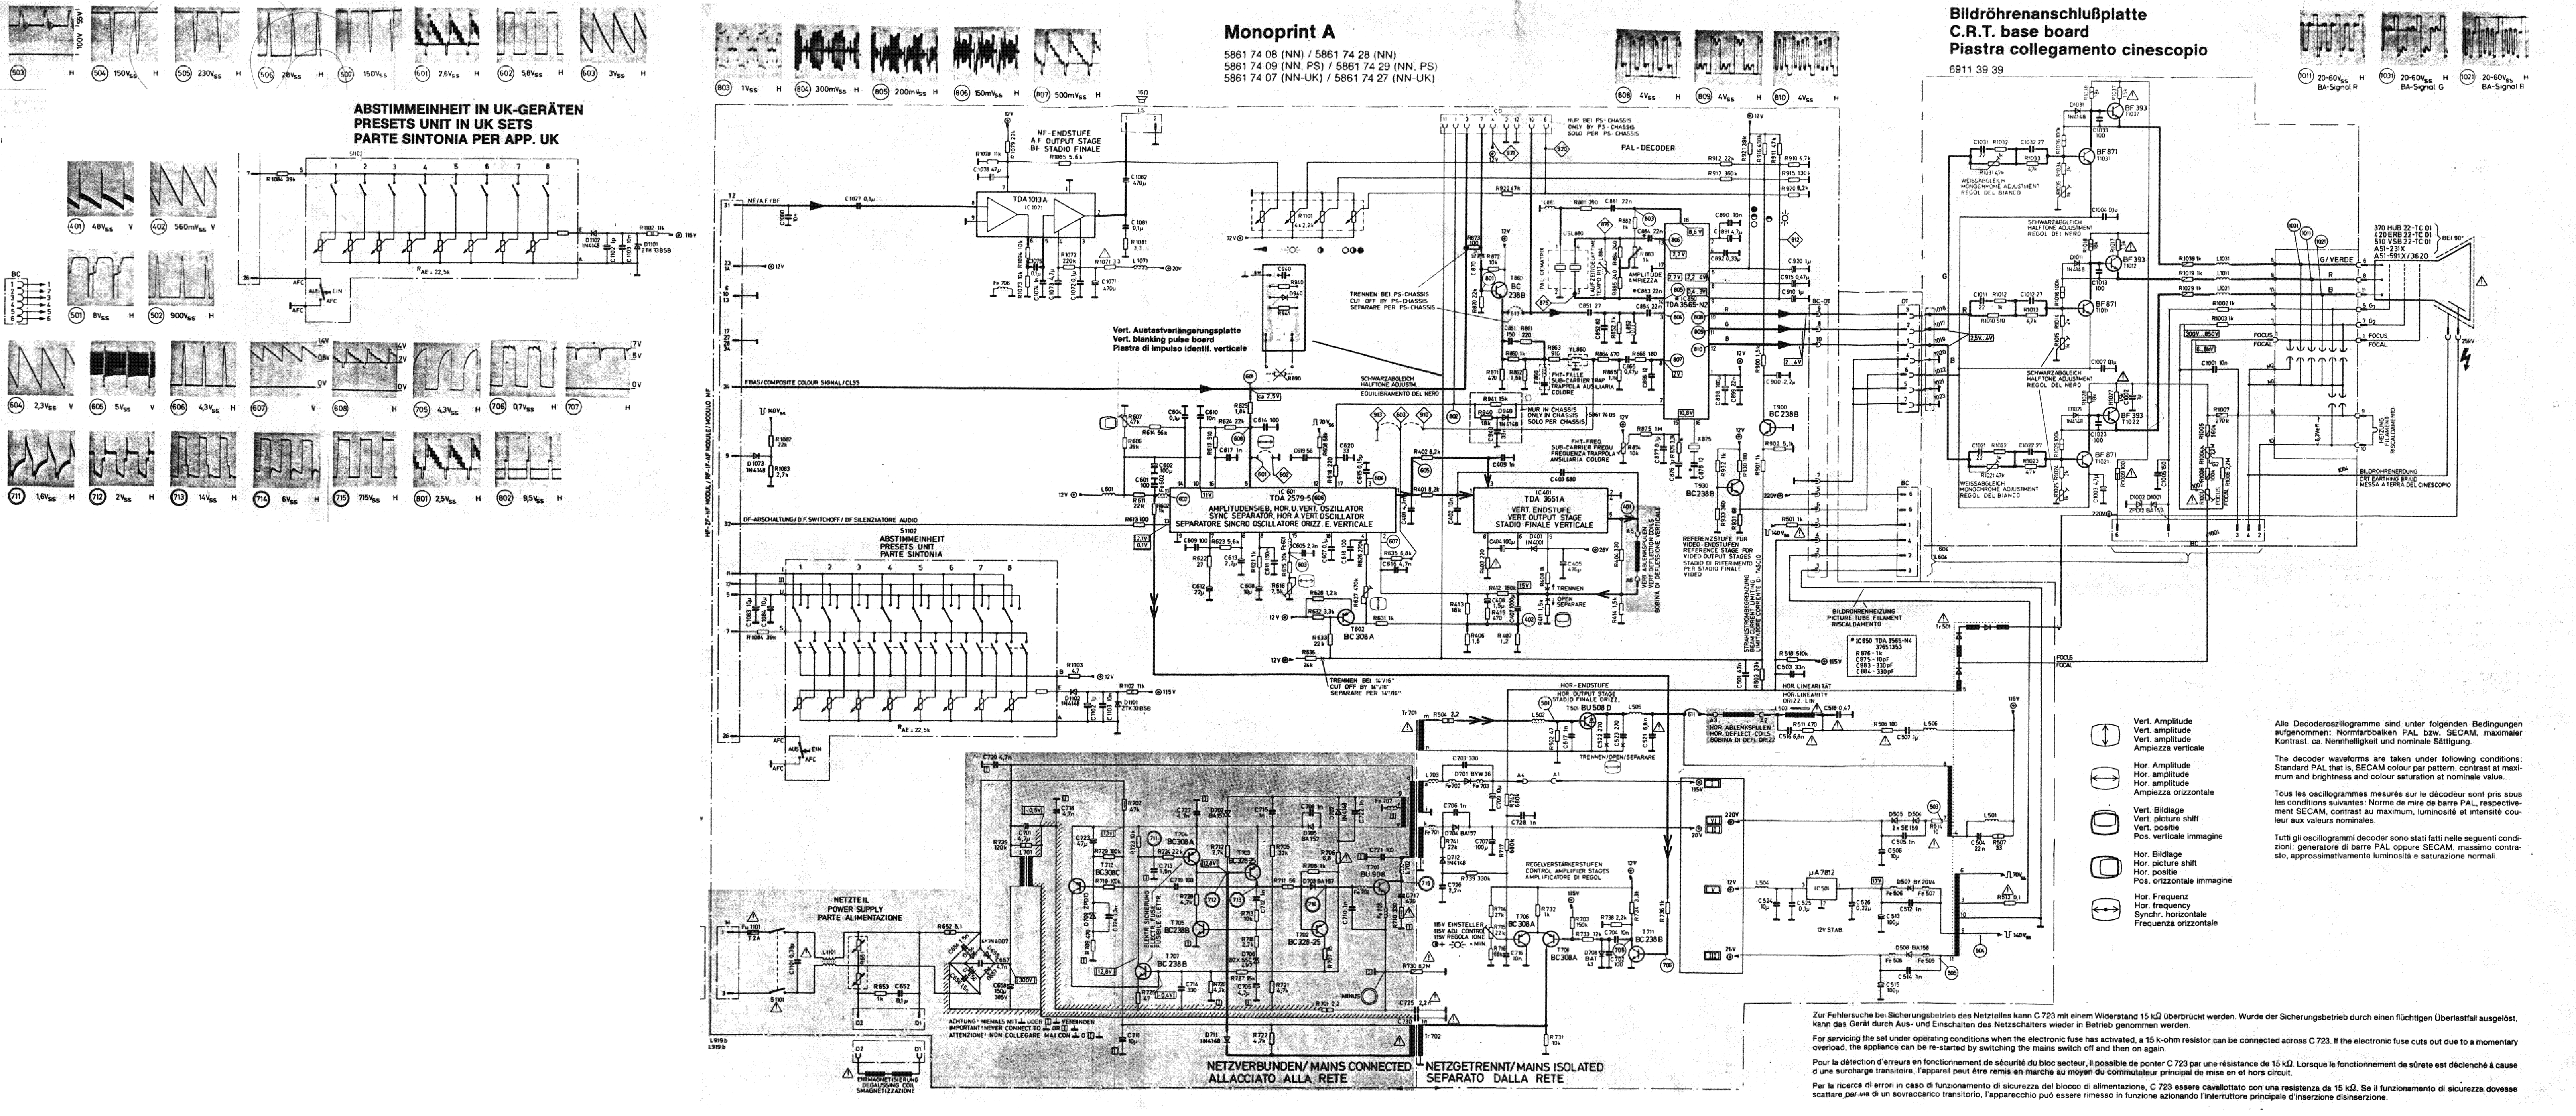 nokia 5861c monoprint a service manual download